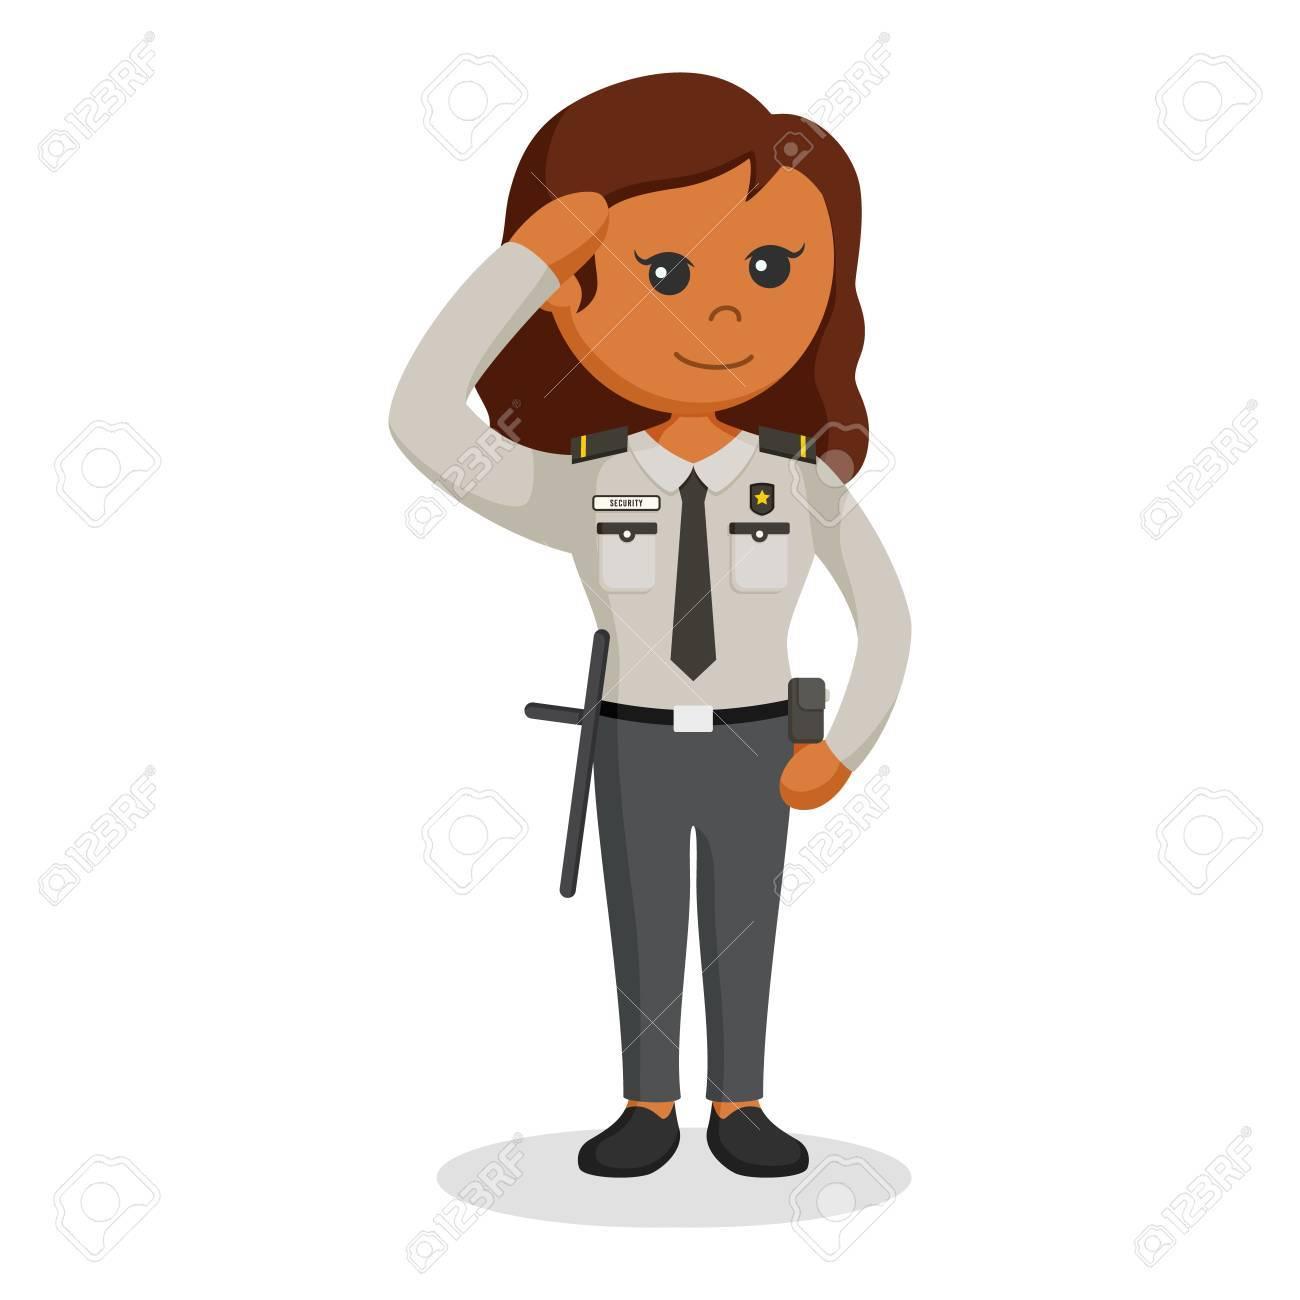 Lady security guard clipart 3 » Clipart Portal.